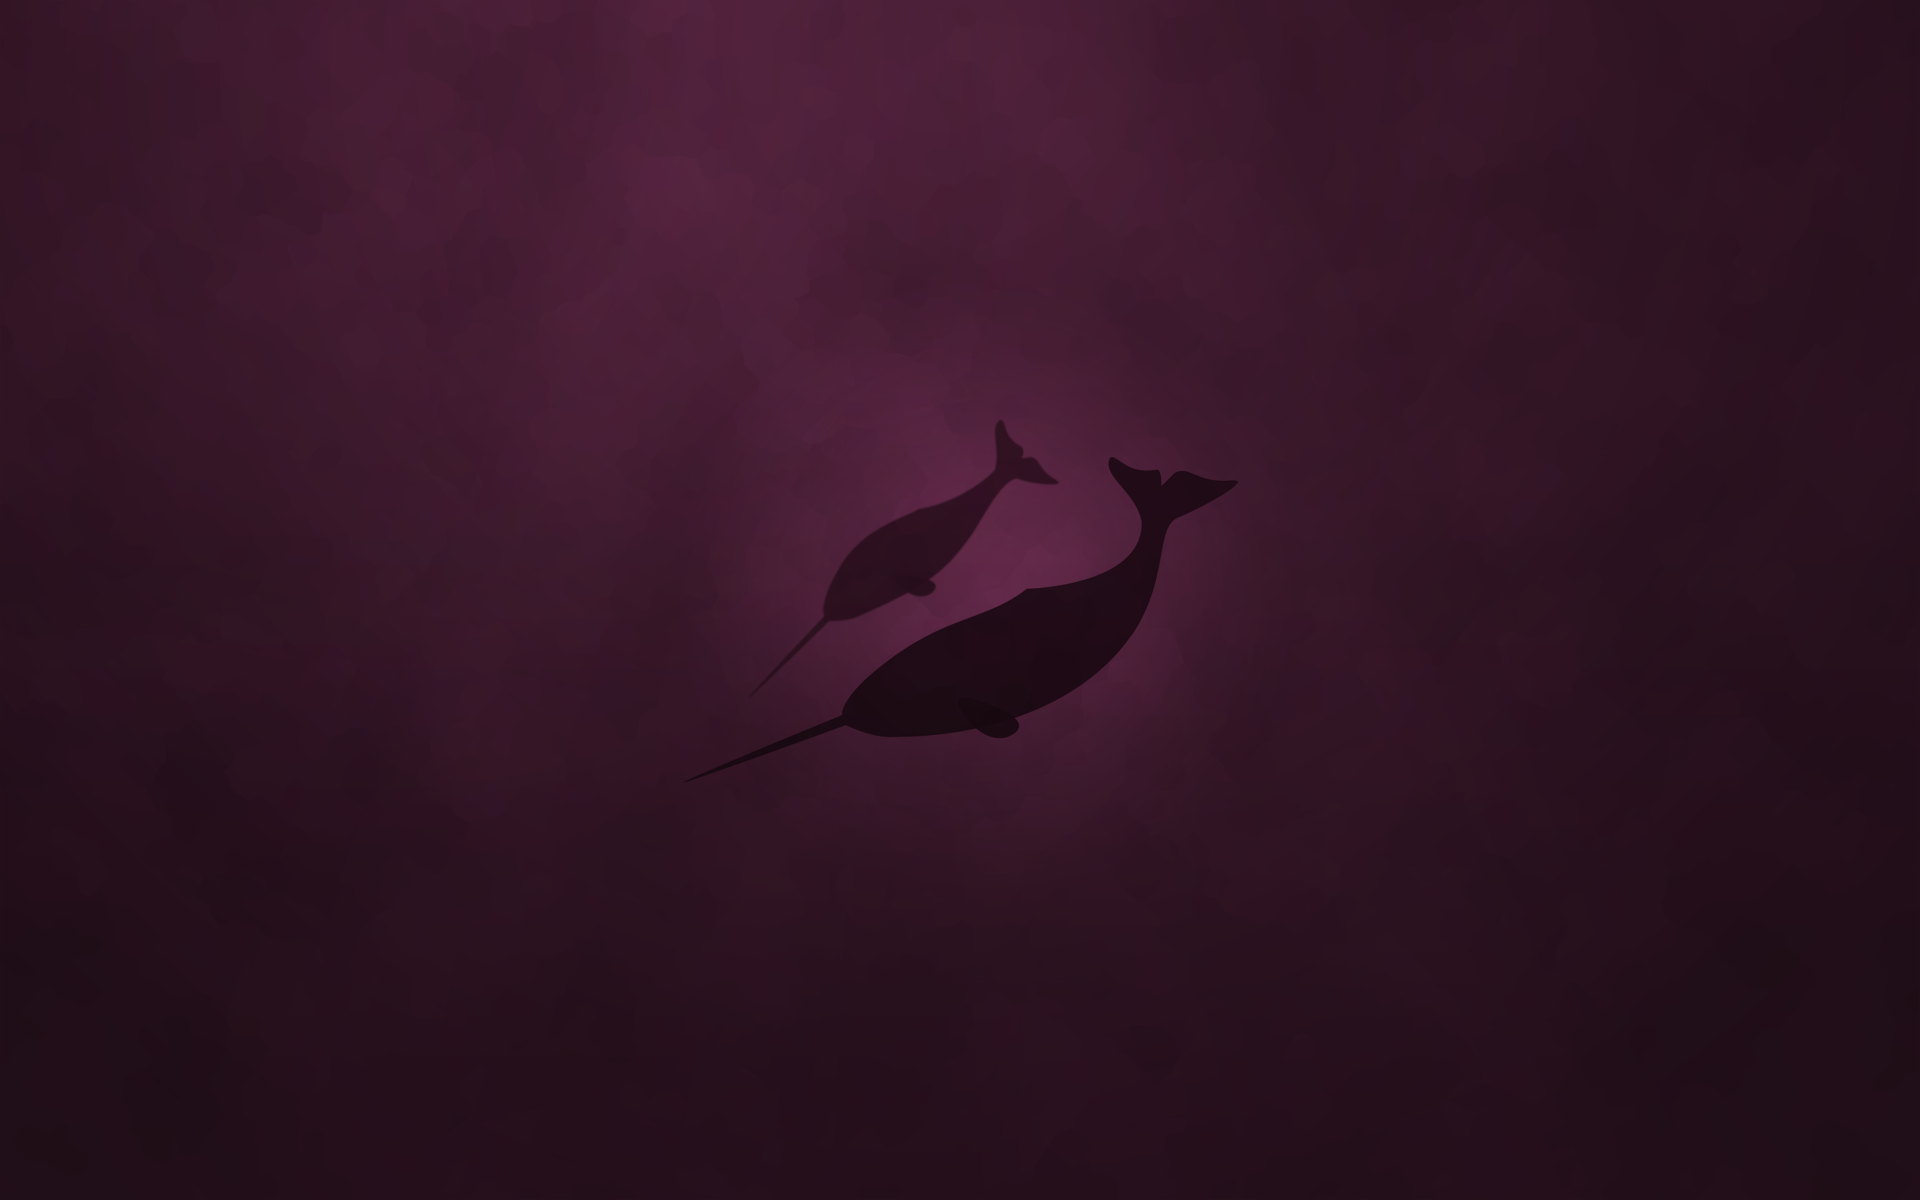 themes ubuntu customized desktop wallpaper natty 1920x1200